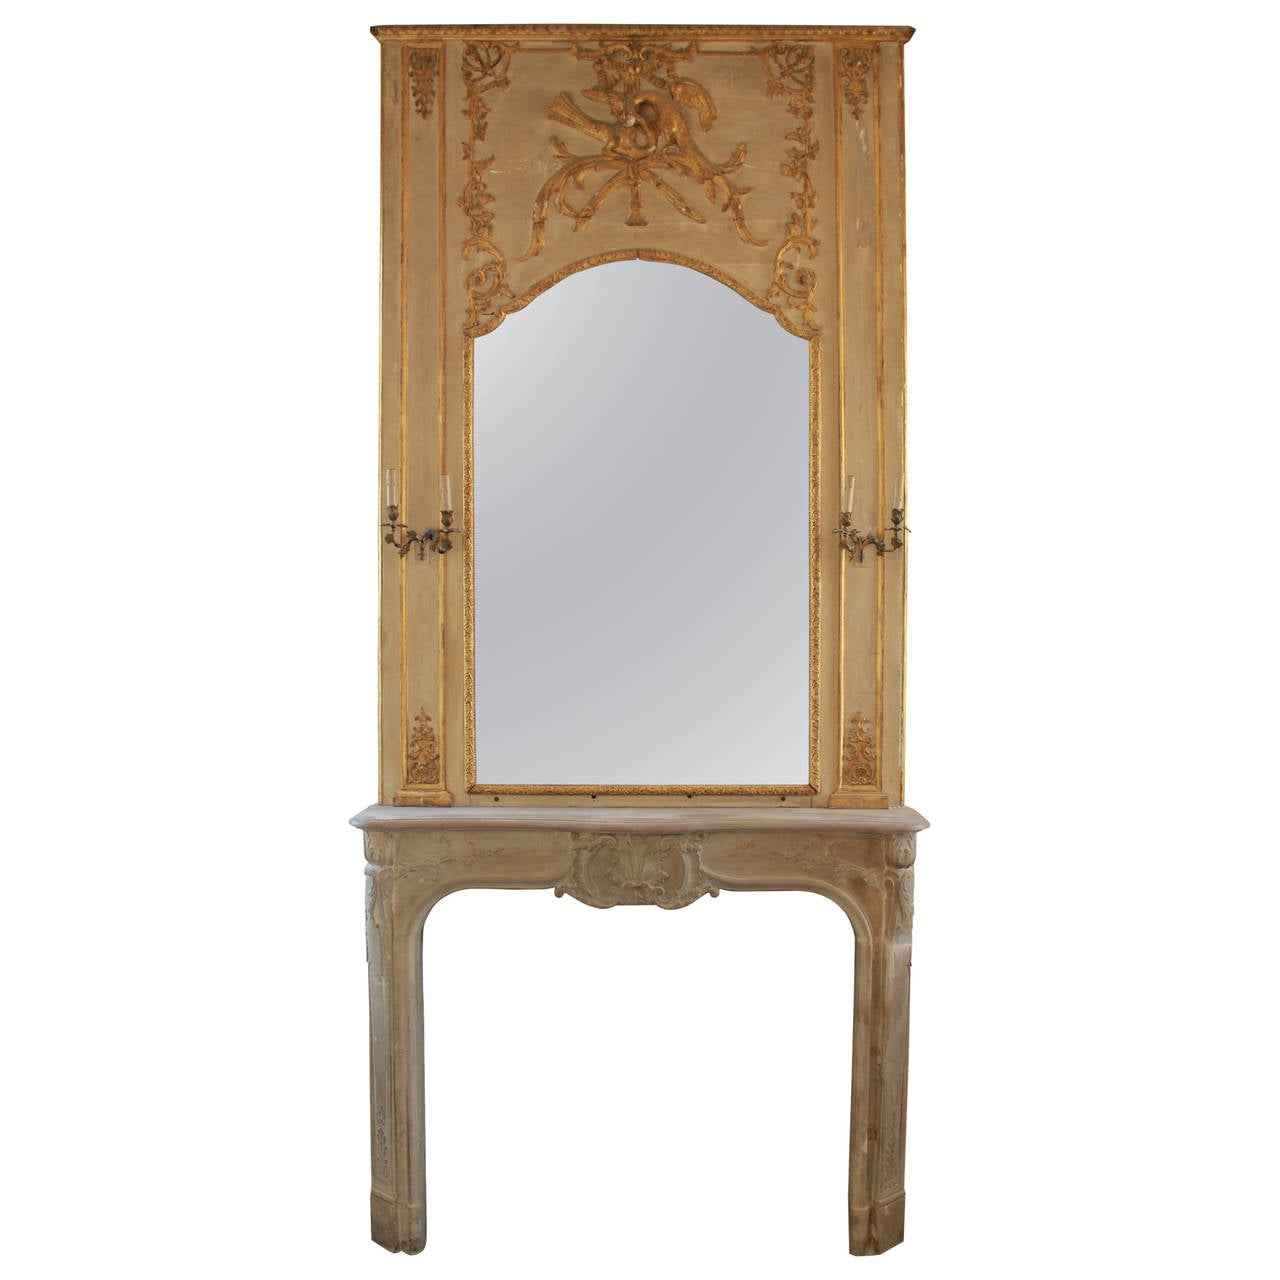 1925 limestone mantel with large gilded overmantel mirror. Black Bedroom Furniture Sets. Home Design Ideas